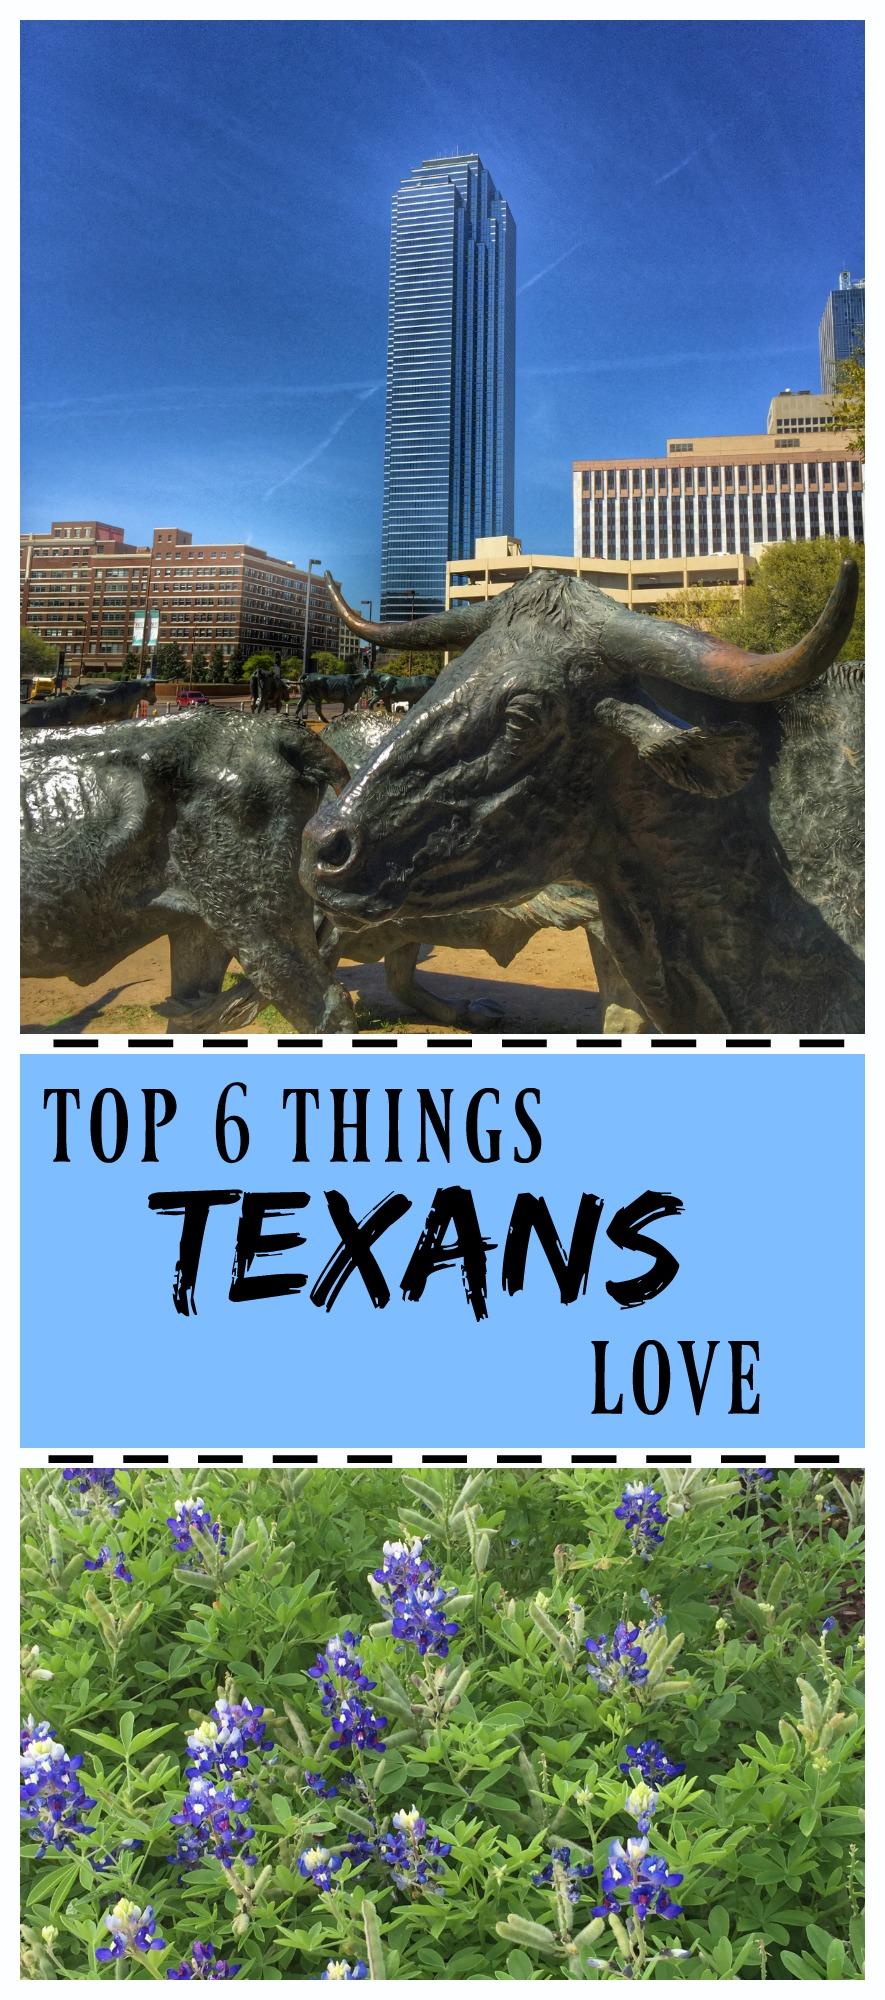 Top 6 Things Texans Love